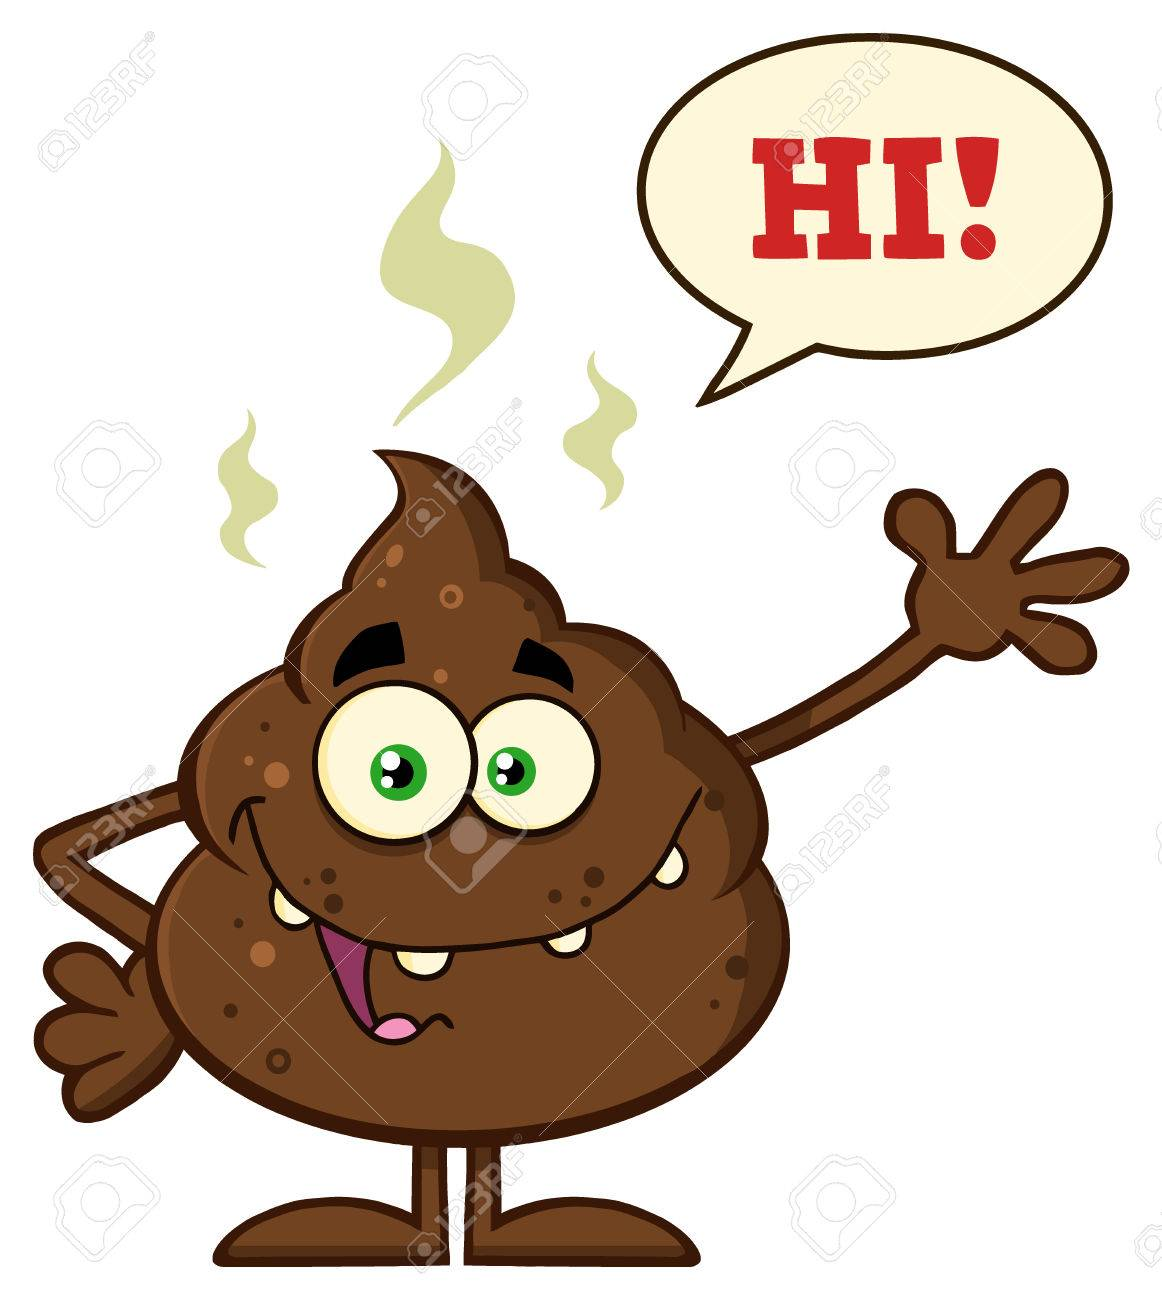 Funny poop cartoon character waving for greeting with speech stock funny poop cartoon character waving for greeting with speech bubble and text hi stock photo m4hsunfo